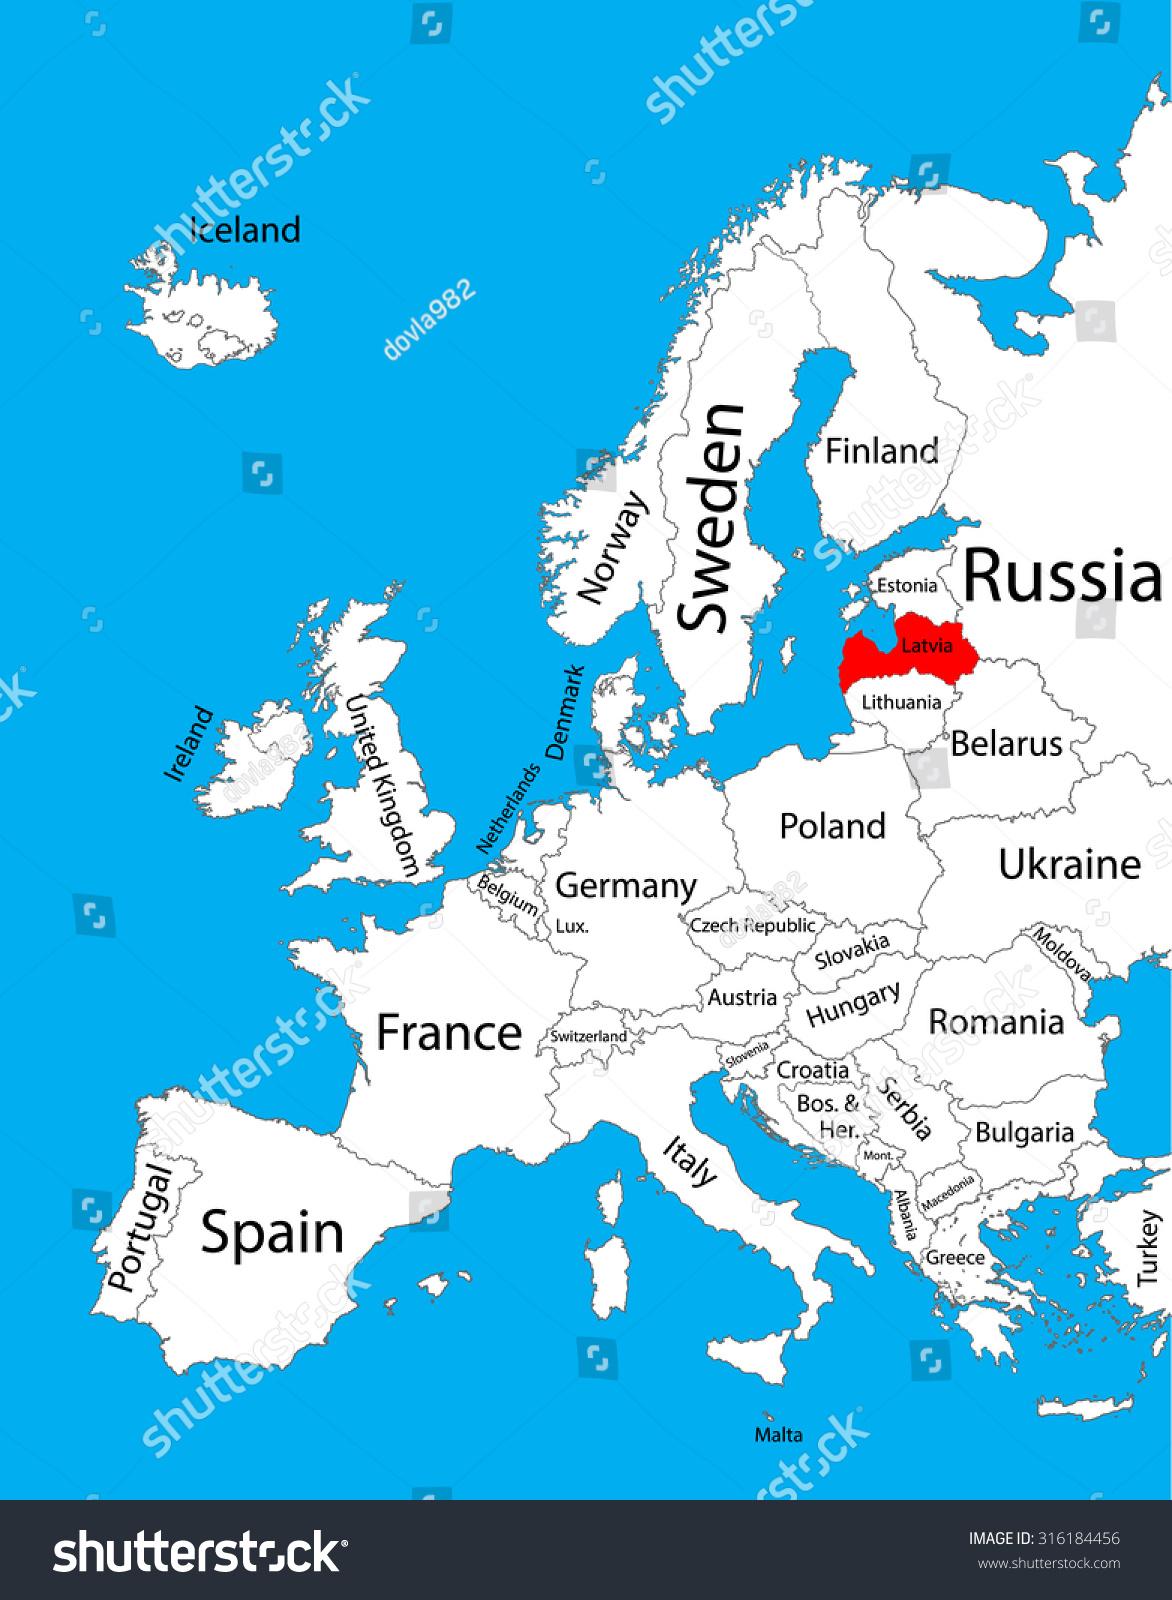 latvia map of europe Latvia Vector Map Europe Vector Map Stock Vector (Royalty Free